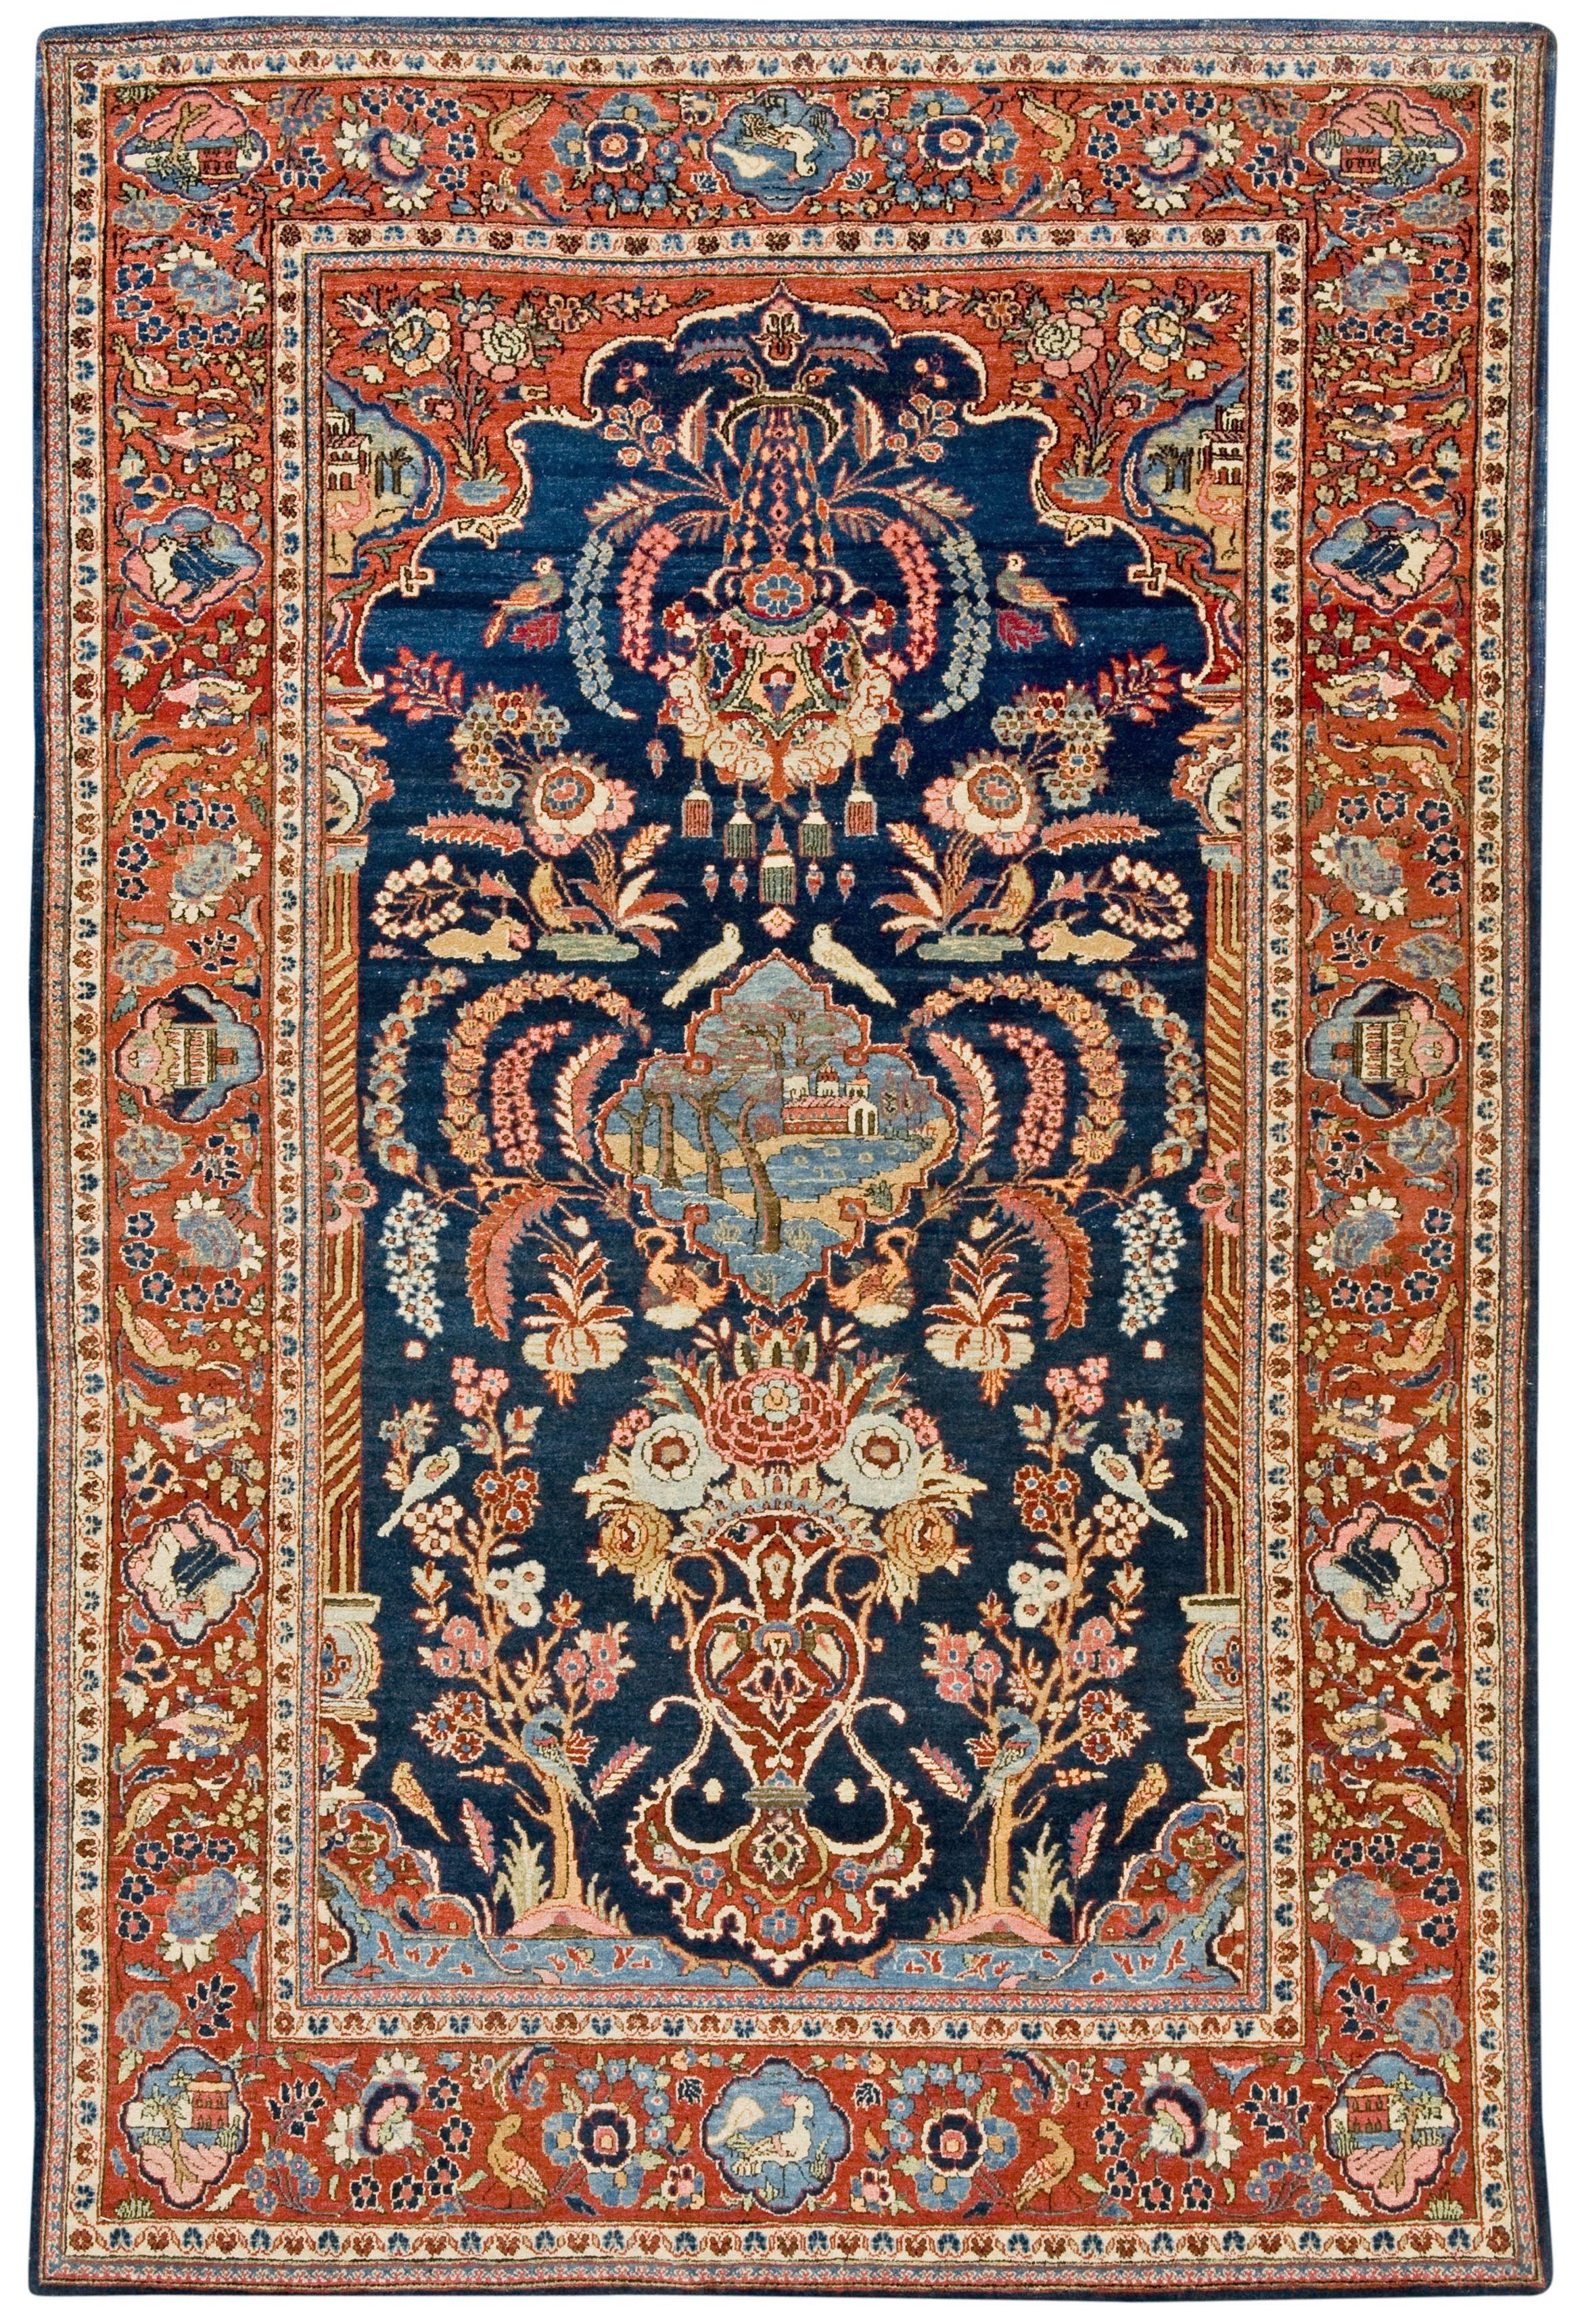 Persian Keshan rug Tappeti persiani, Tappeti